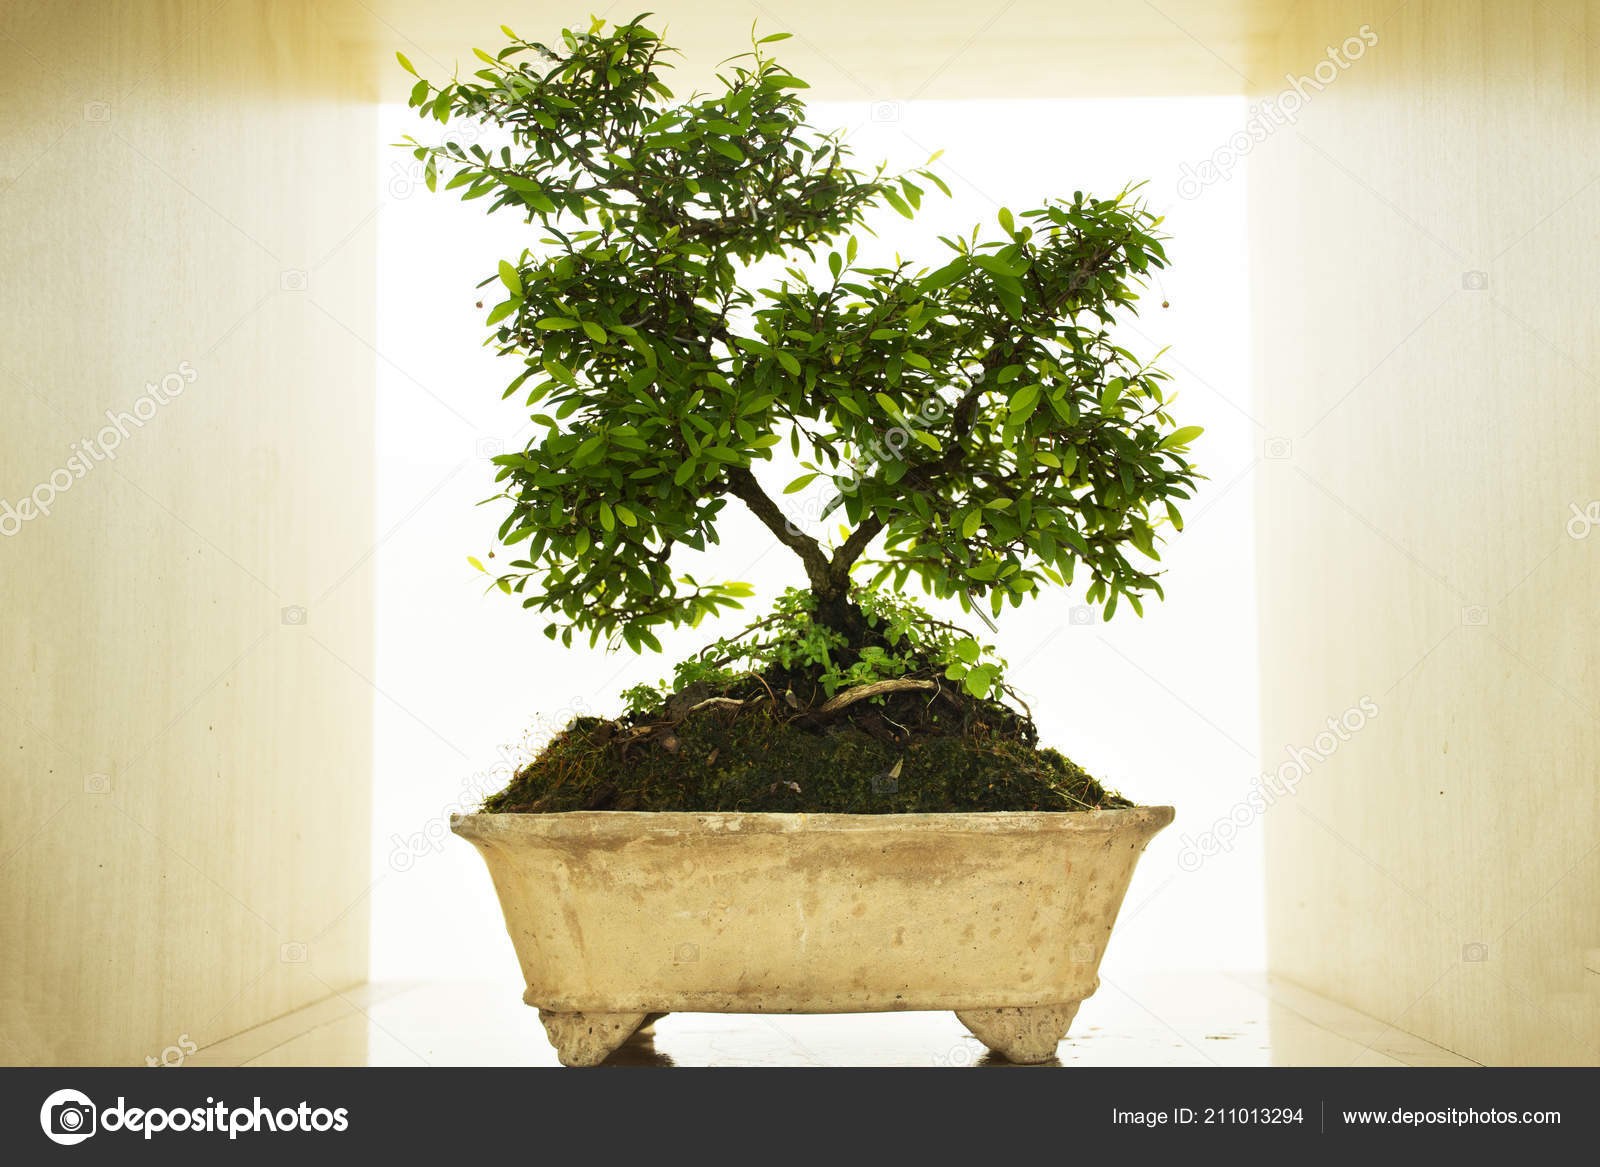 Diy Small Garden Little Tree Bonsai Show Sale Workshop Thailand Stock Photo C Anirut 211013294